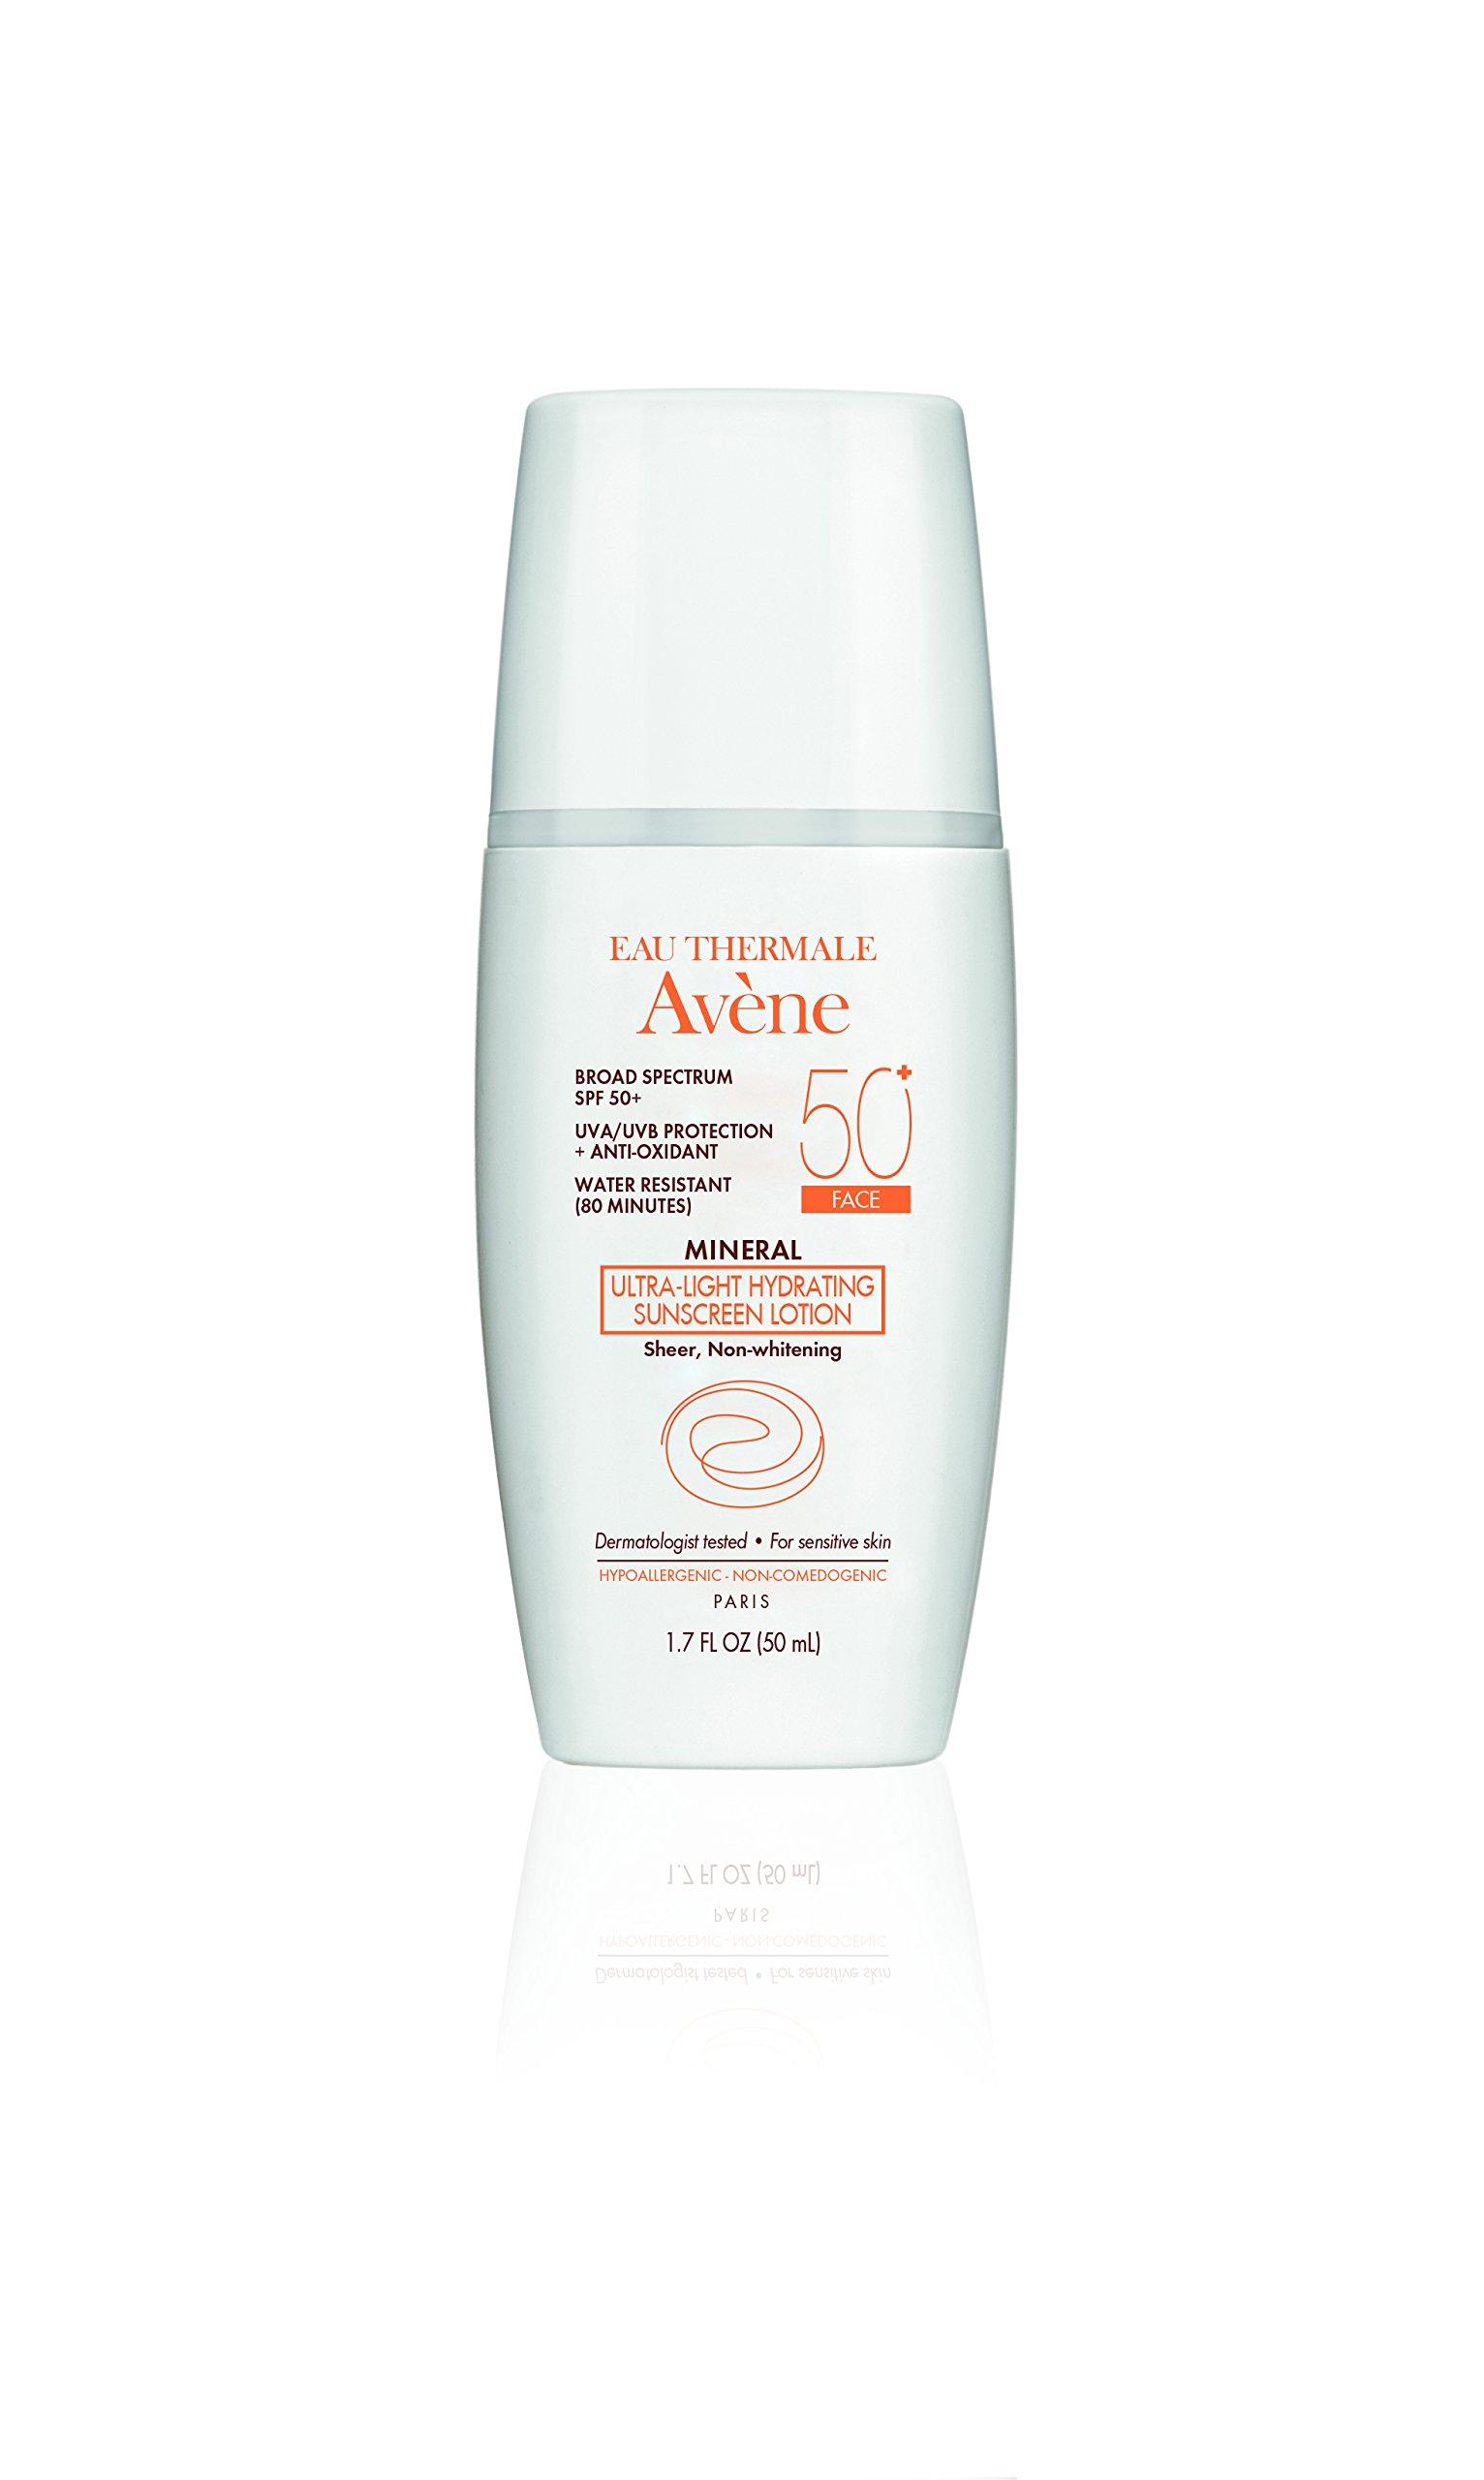 Avene Mineral Ultra-Light Hydrating Sunscreen SPF 50 Plus Face Lotion, 1.7 Fluid Ounce